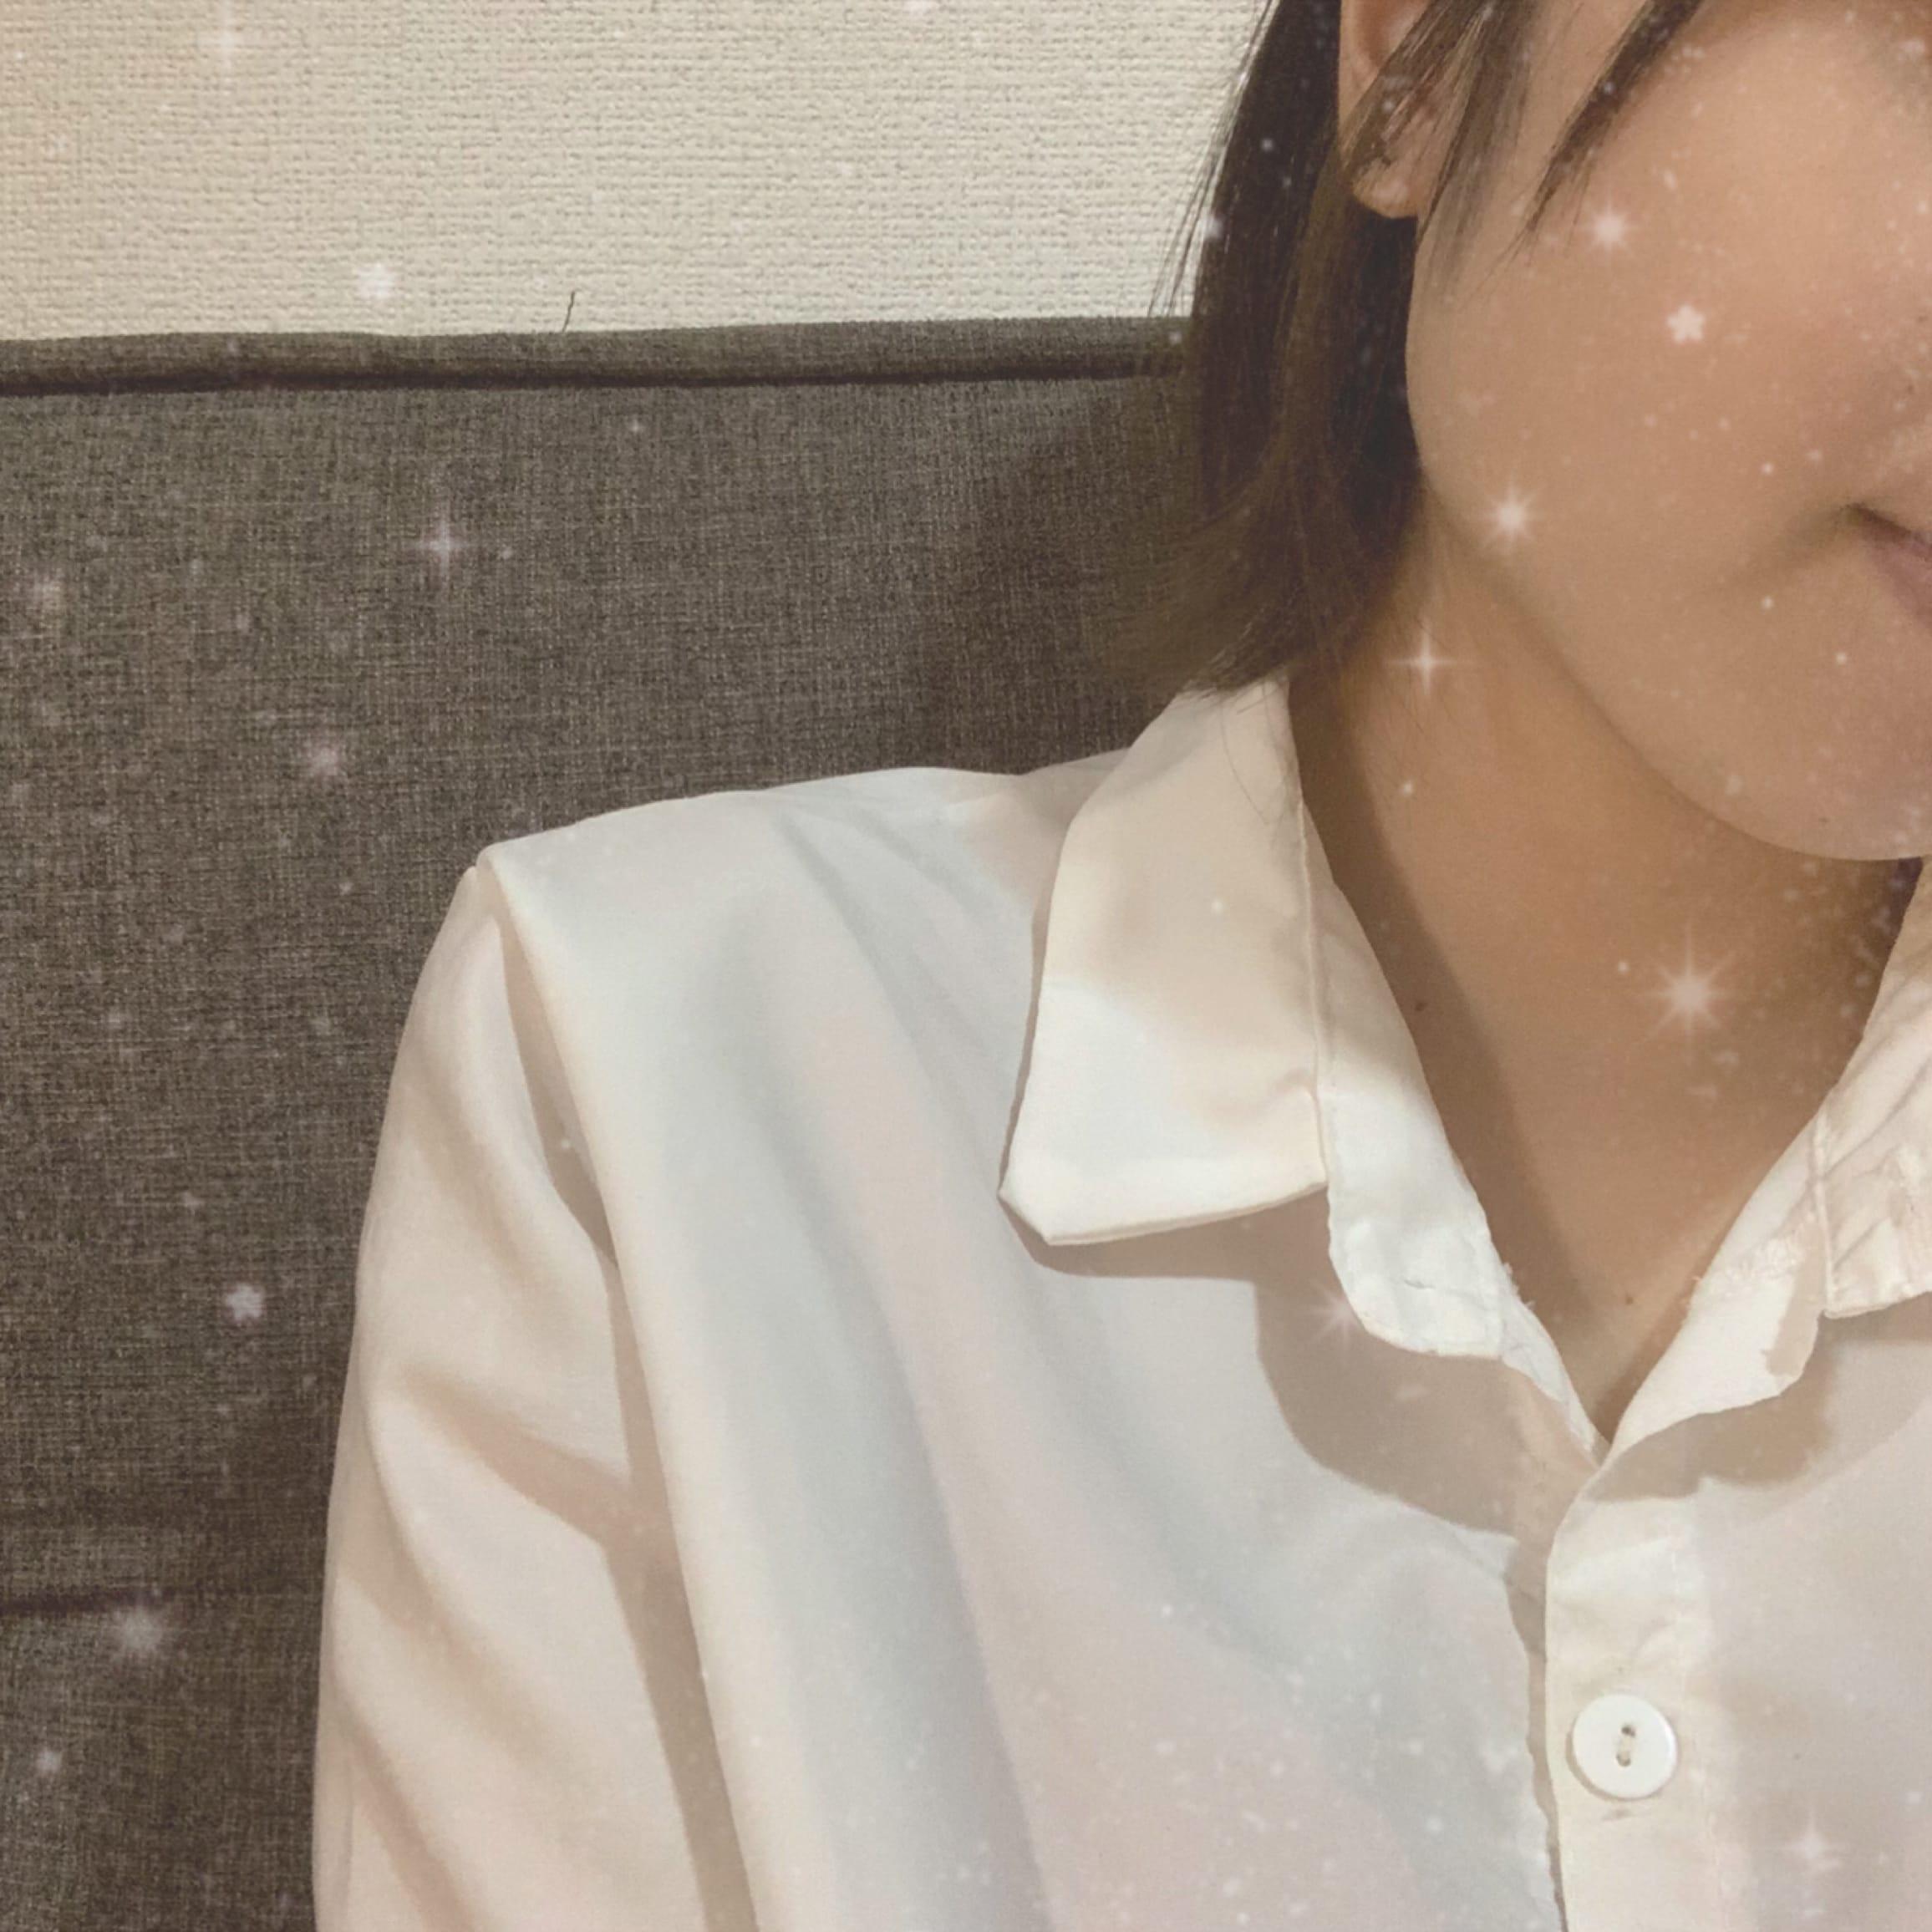 「出勤中♩¨̮」10/06(水) 18:46   椿-tsubaki-の写メ日記